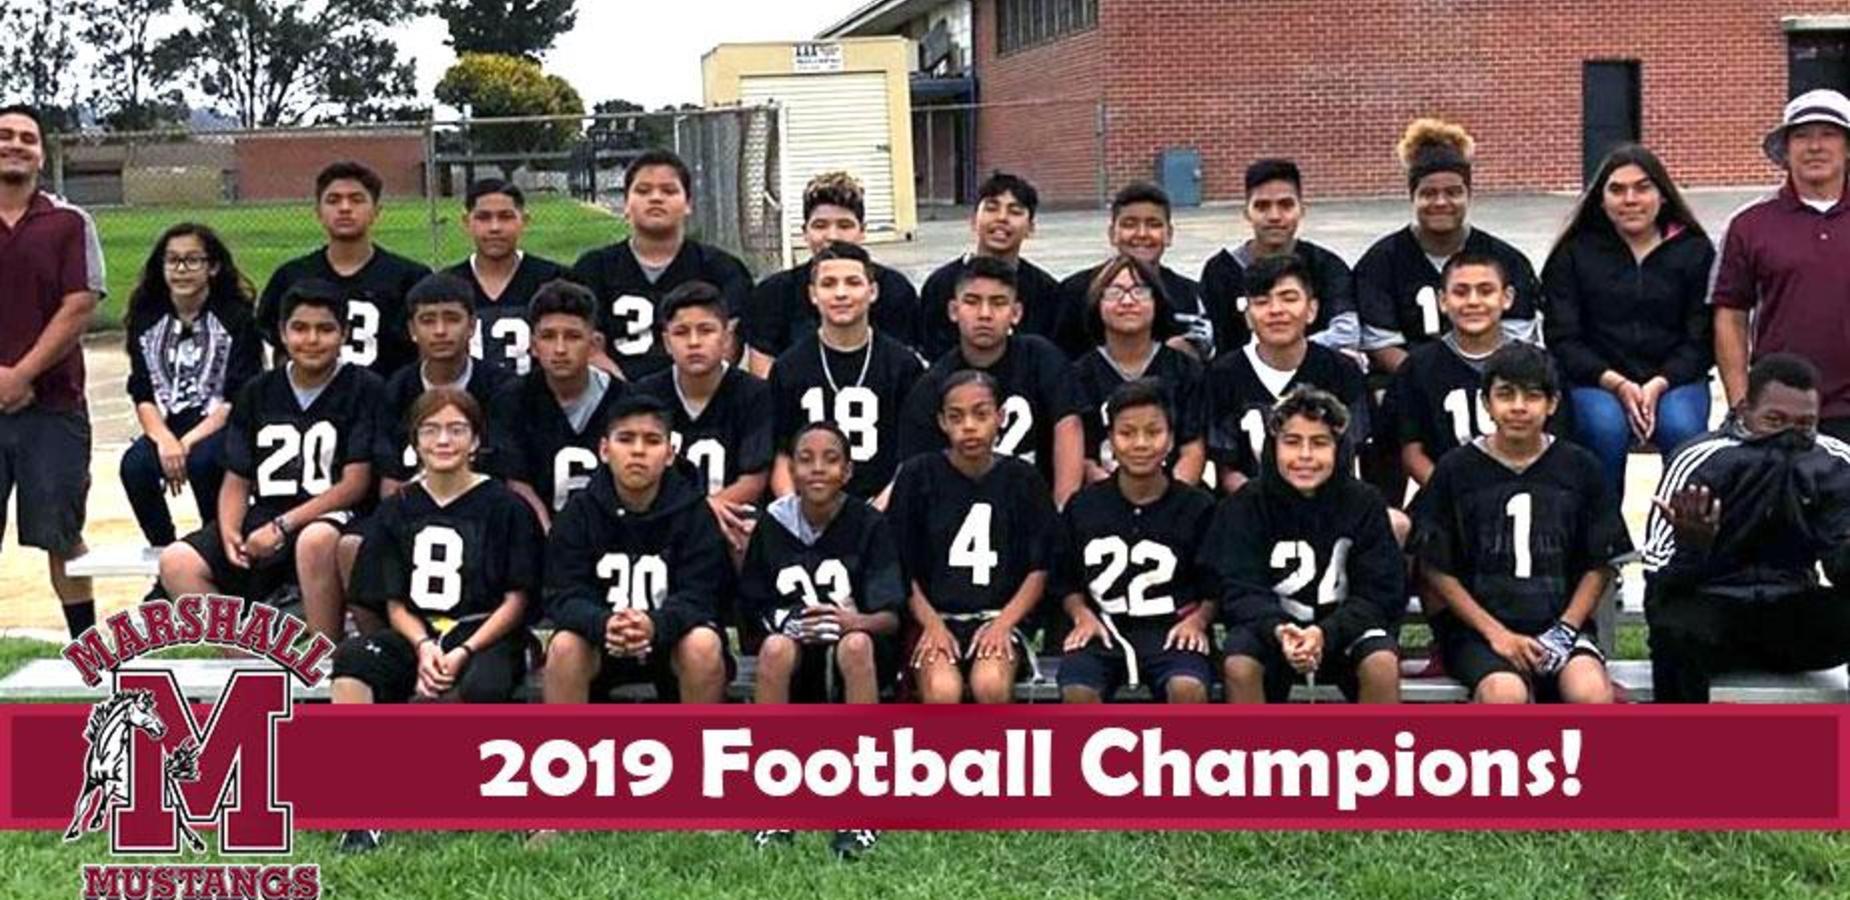 2019 Football Champions! Congratulations Mustangs!